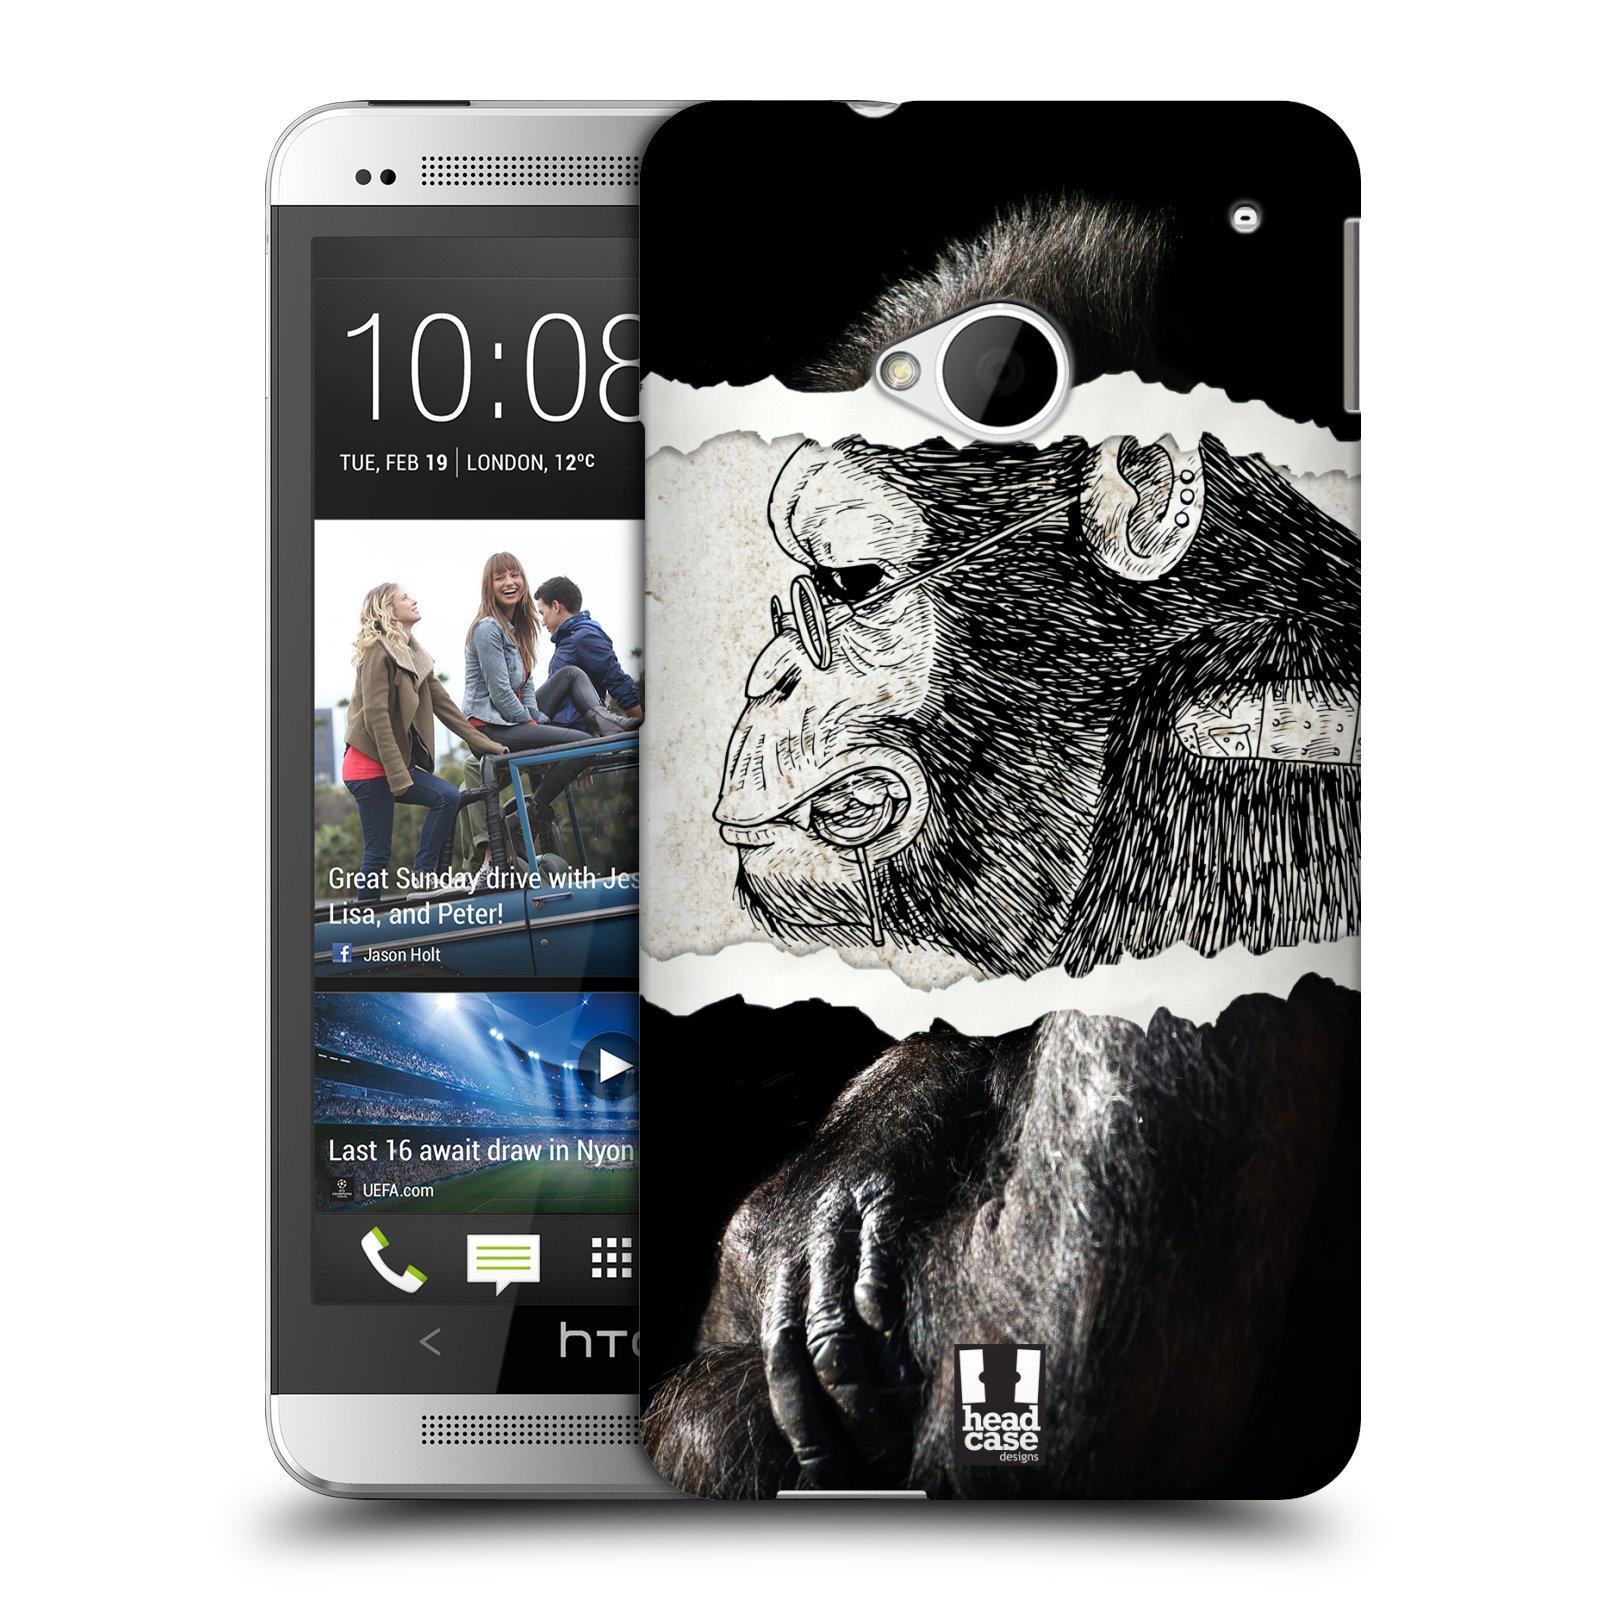 HEAD CASE plastový obal na mobil HTC One (M7) vzor zvířata koláž opice